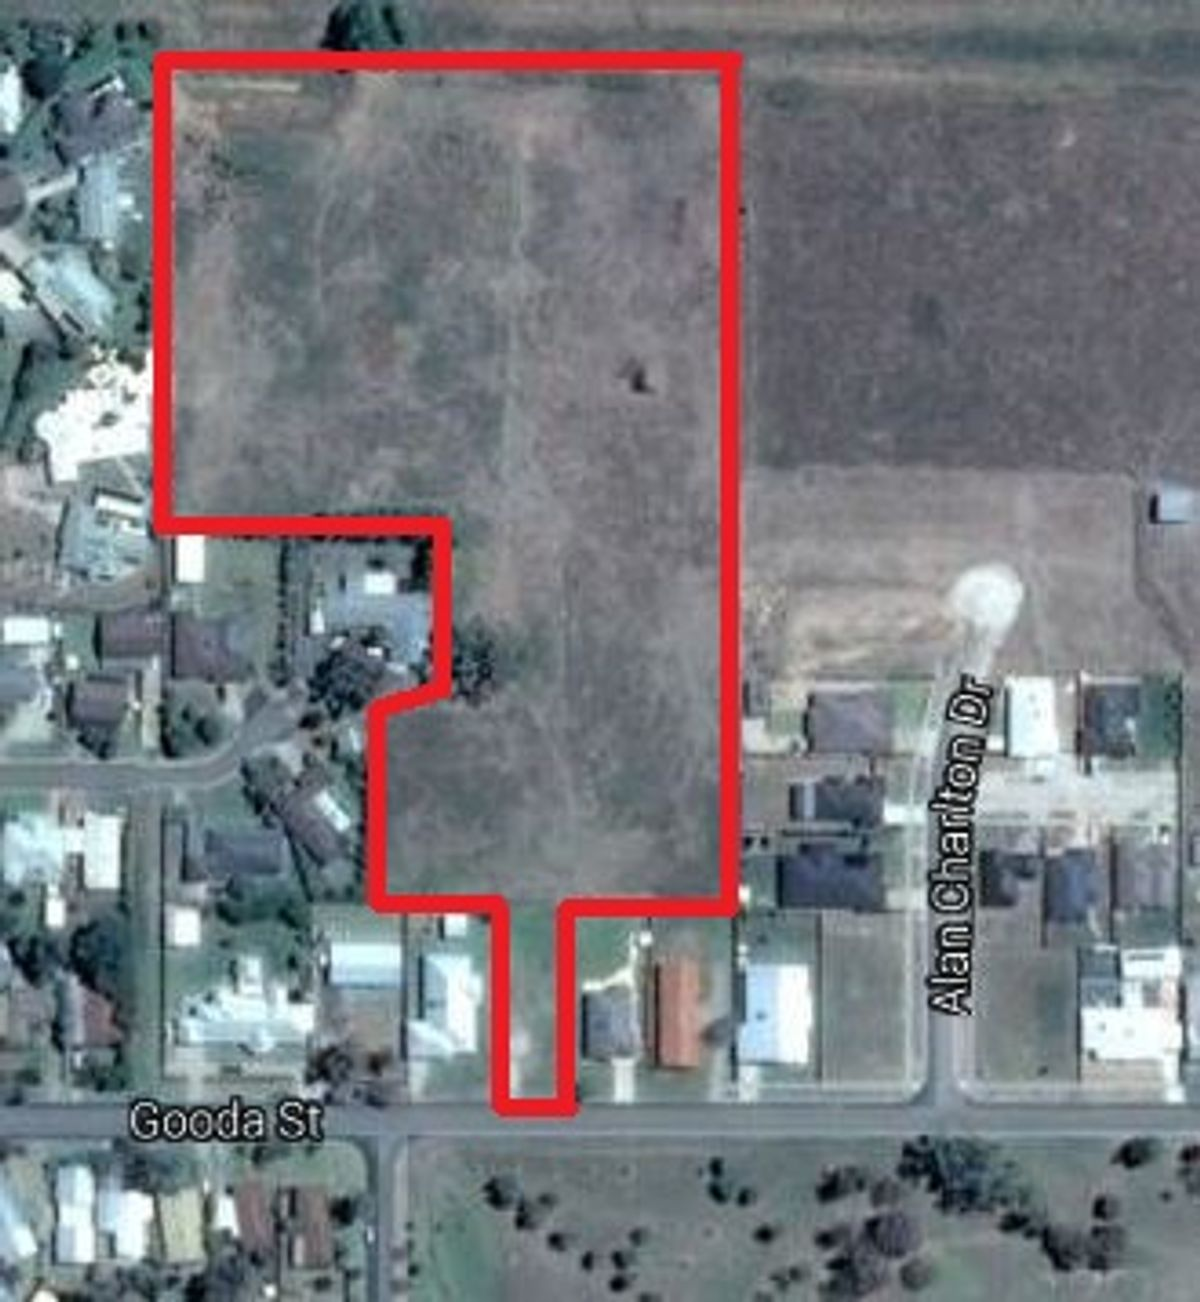 Lot 1 - 25 Gooda Street, Tongala, VIC 3621